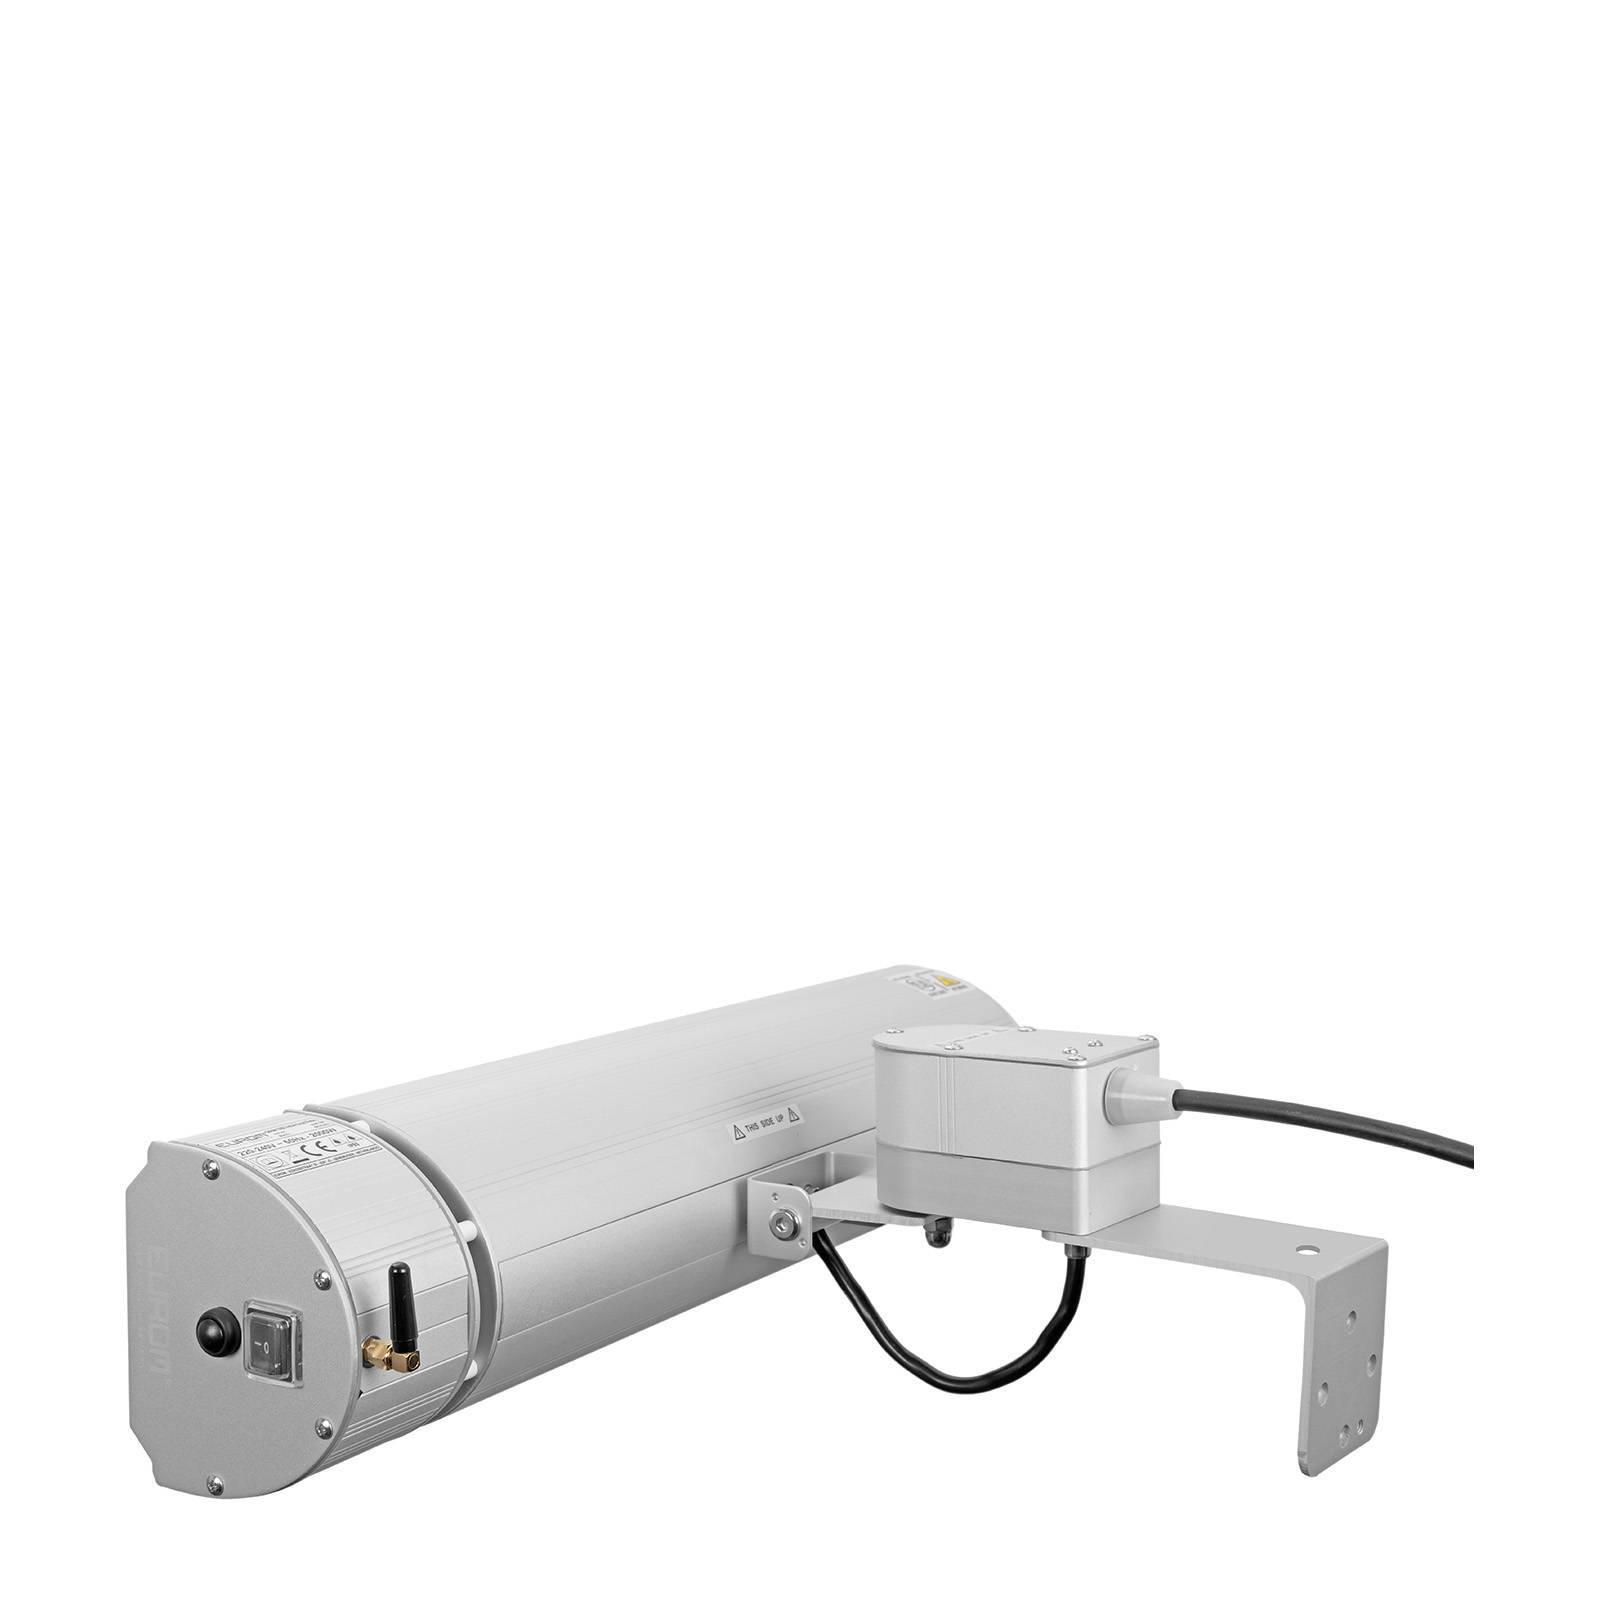 Licht Projector Kinderkamer : Eurom heater golden 2000 amber smart rotary incl. afstandsbediening